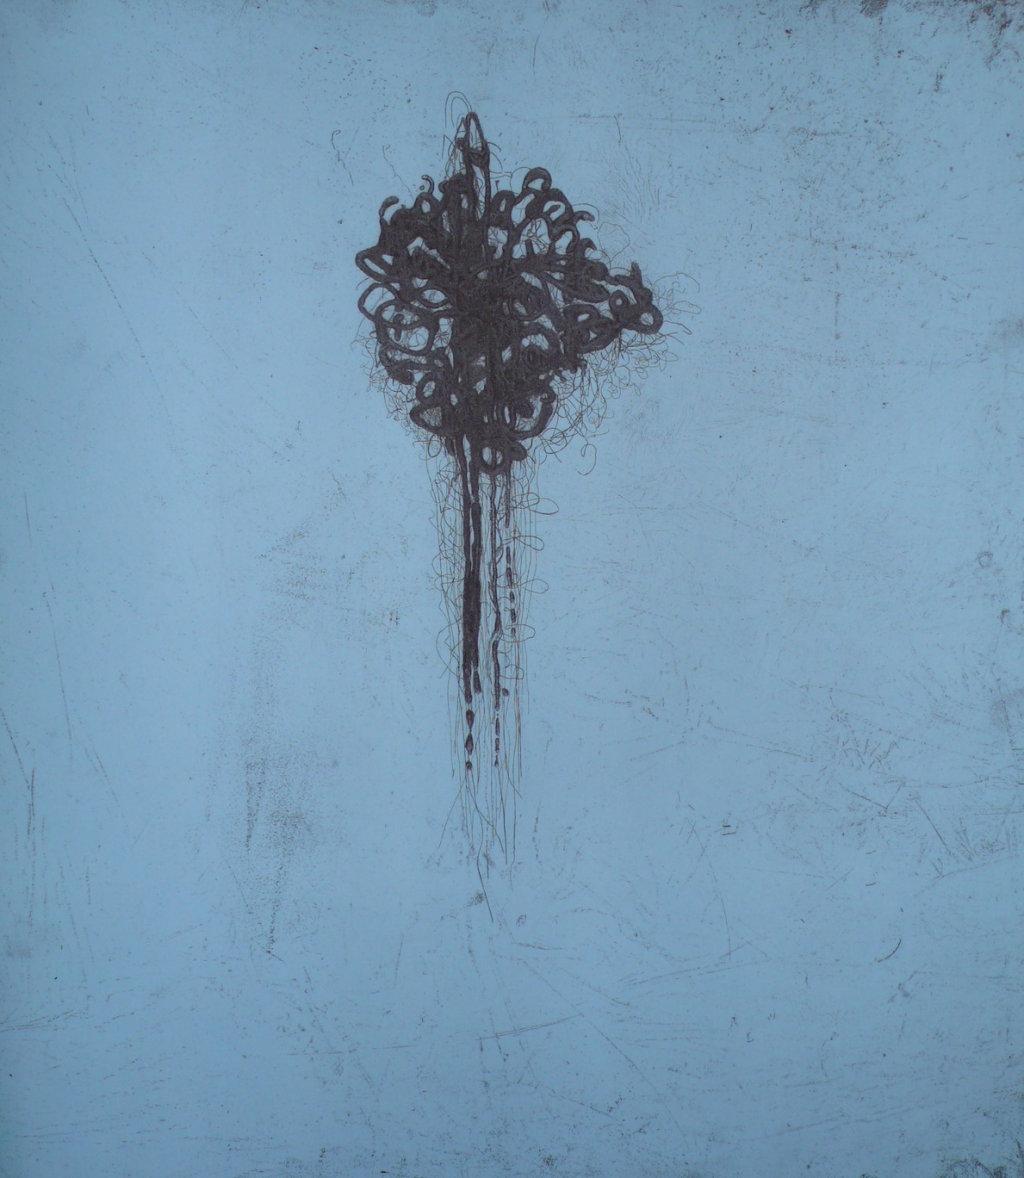 Satoris II<br> Etching, edt 10 <br> 60 x 54 cm, 2013